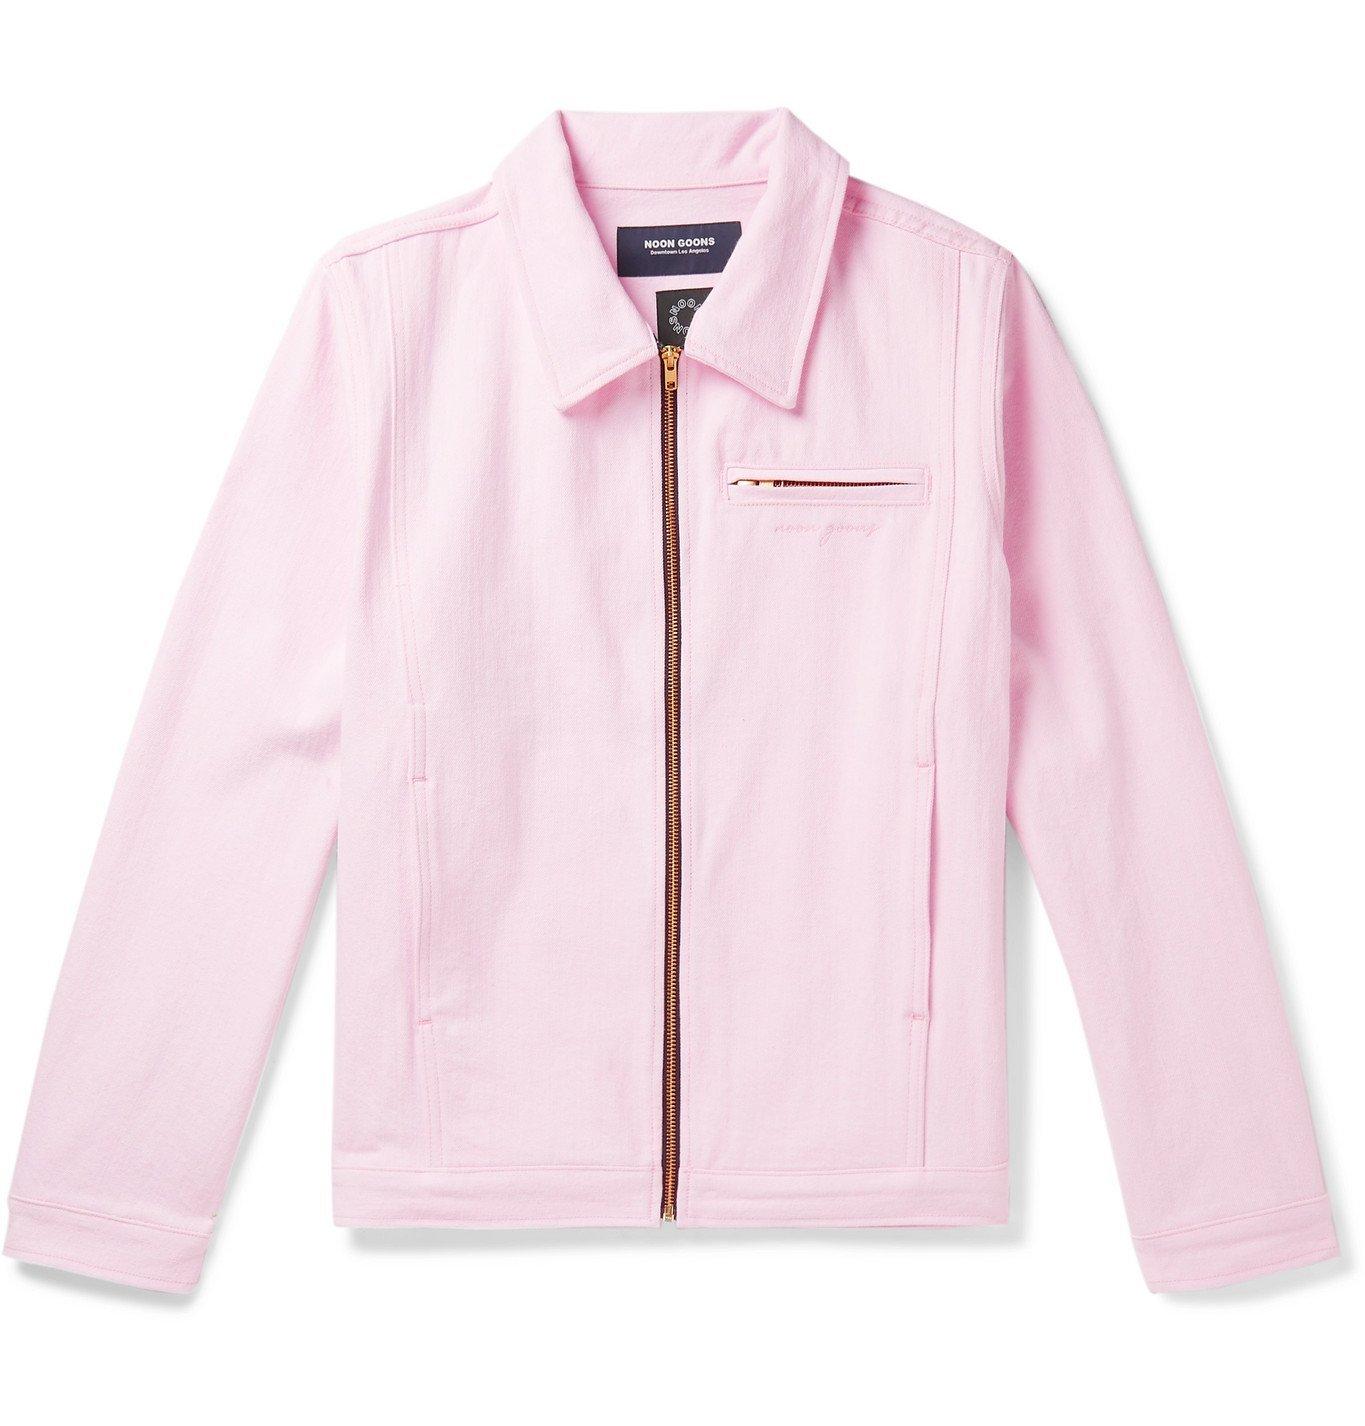 Photo: Noon Goons - Glasser Oversized Garment-Dyed Denim Jacket - Pink